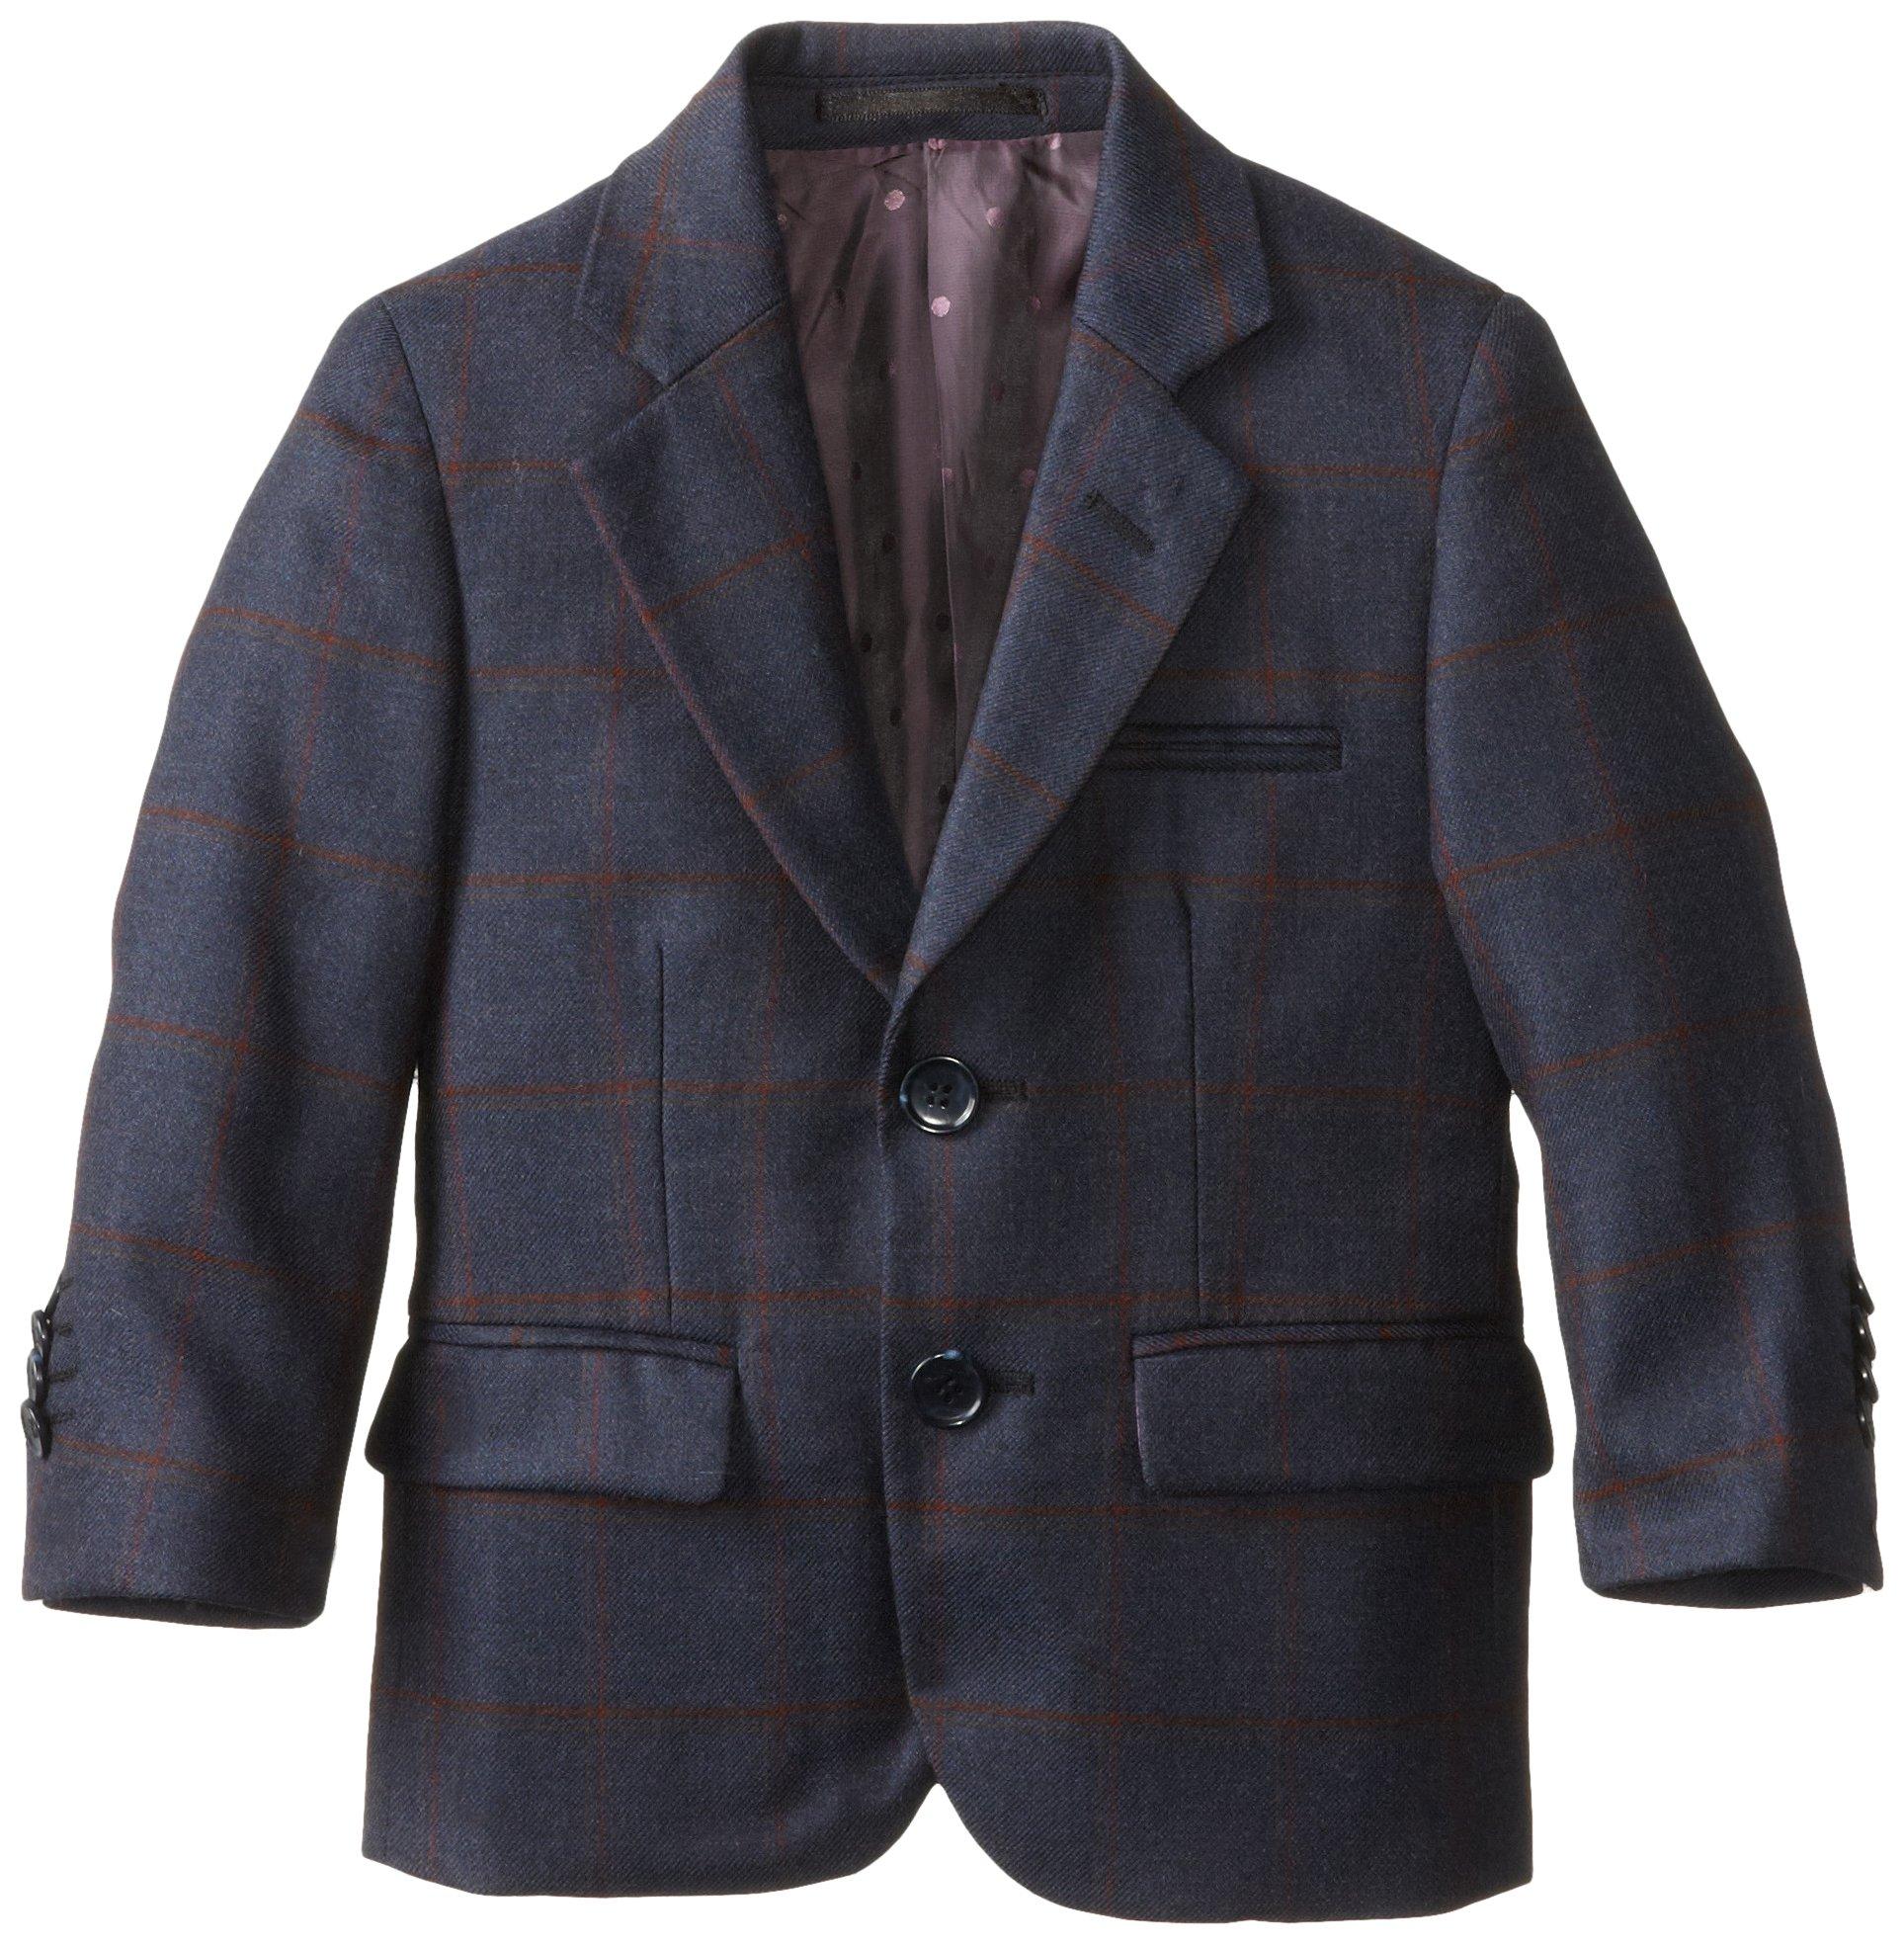 Isaac Mizrahi Black Label Little Boys' Little Pure Wool Plaid Blazer, Blue, 5